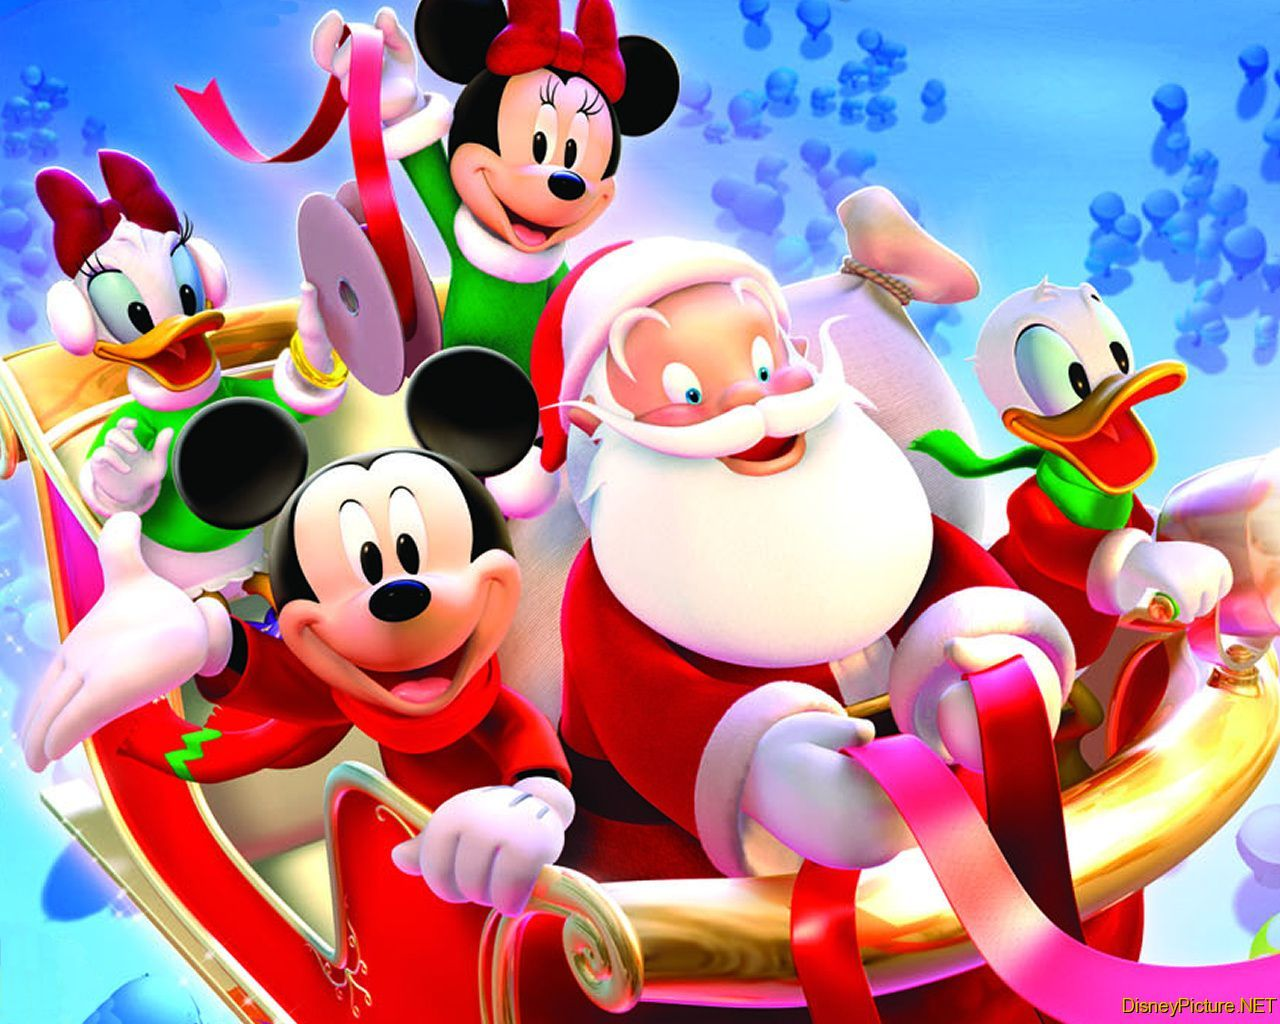 http://2.bp.blogspot.com/-J561CanA6AA/TtIq3i8f8qI/AAAAAAAAB2c/Lb7dTOf8w6Y/s1600/Disney%2BChristmas%2BWallpapers%2B1.jpg